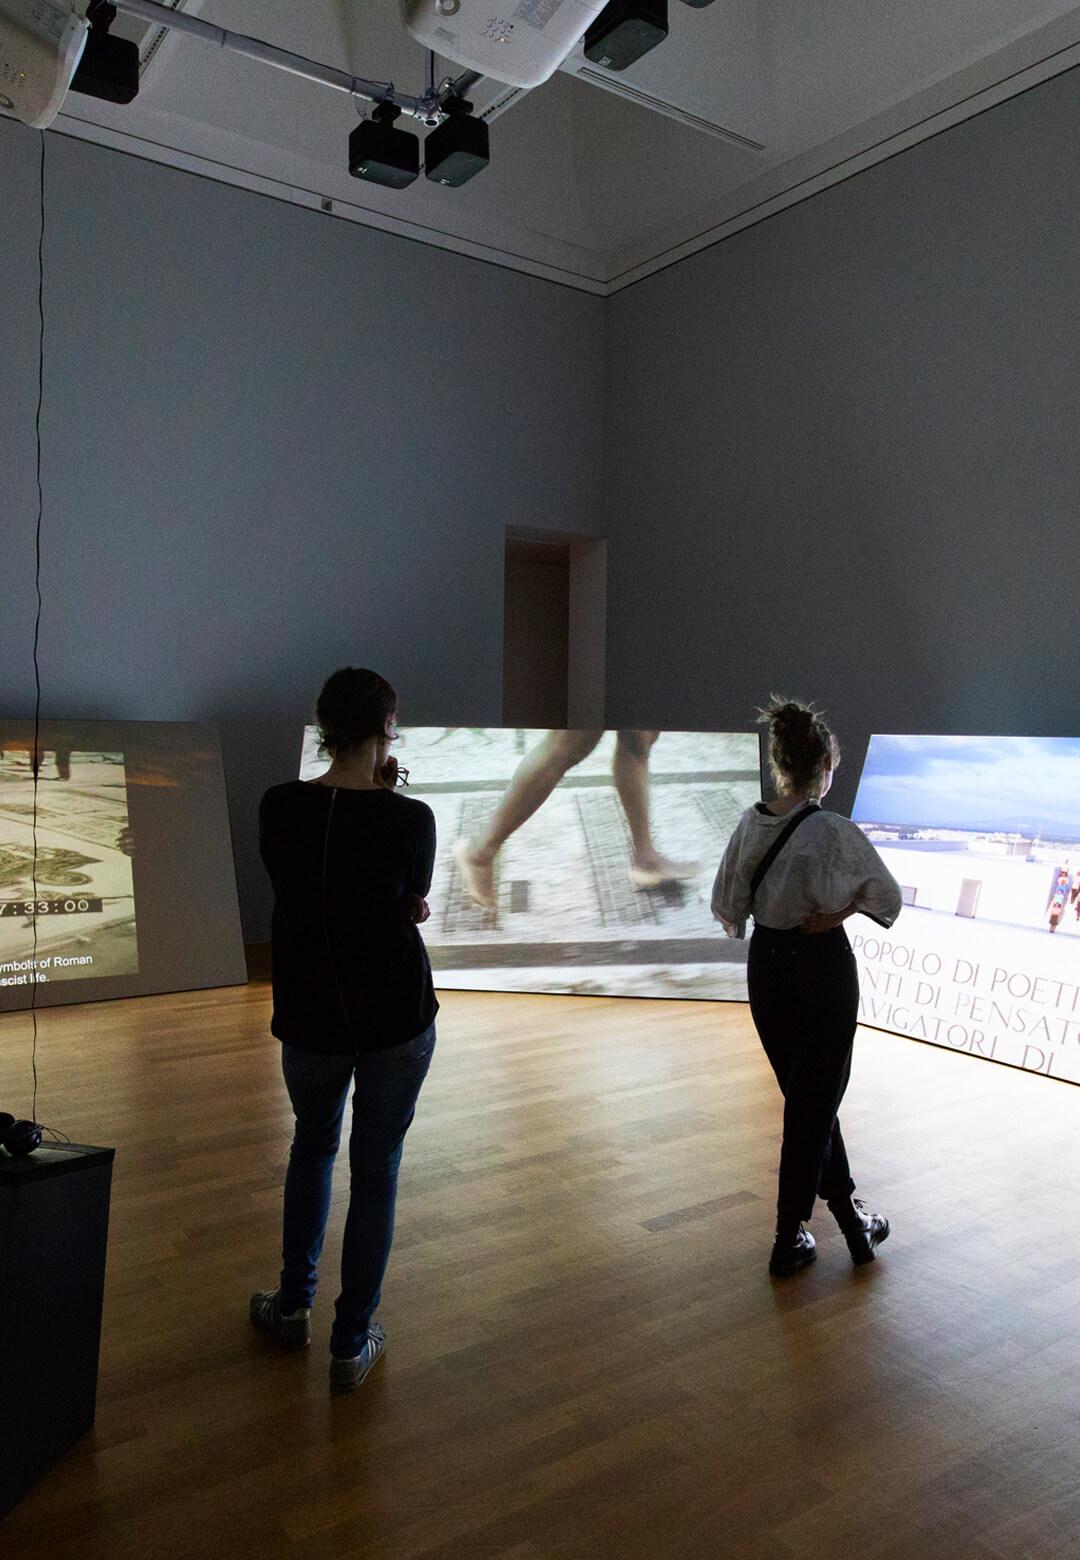 VIDEONALE.17 exhibition view 1 c/o Kunstmuseum Bonn, exhibition architecture Ruth Lorenz maaskant Berlin